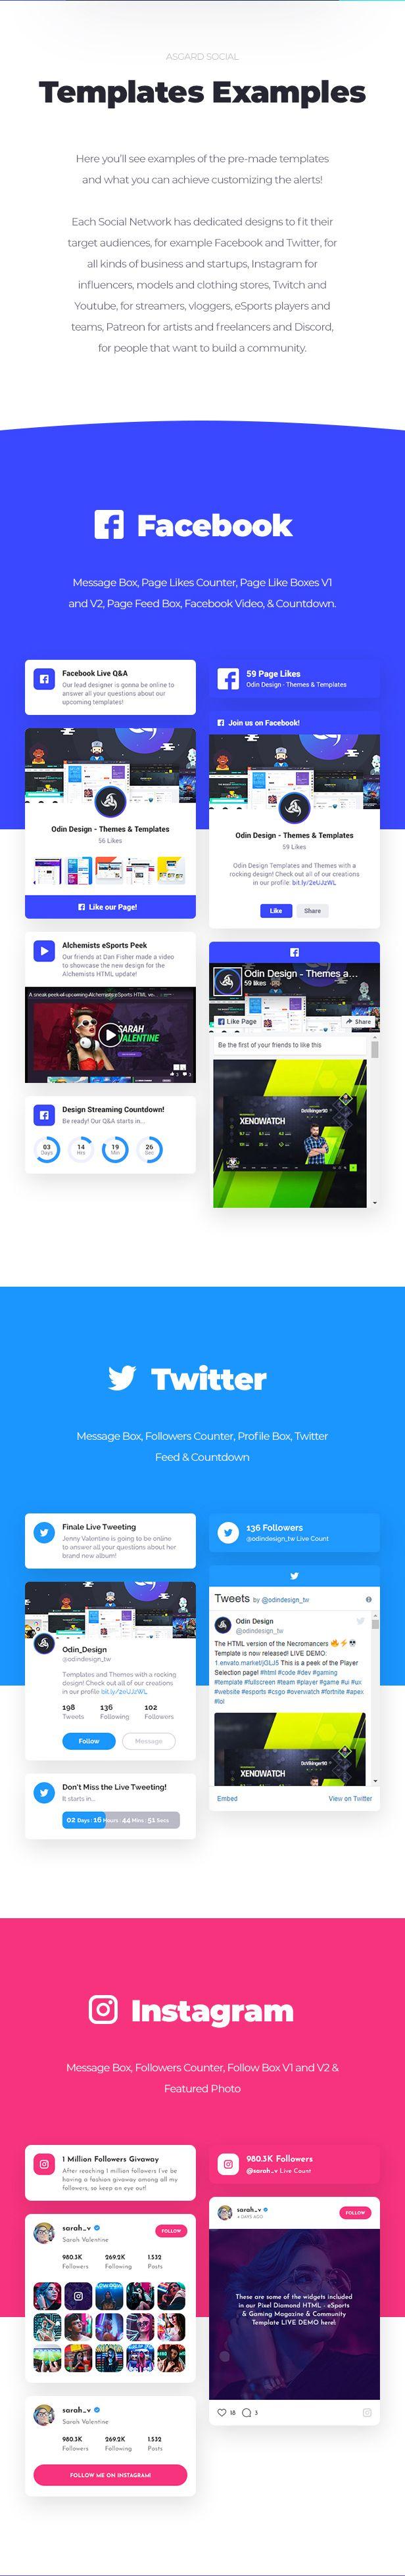 Asgard - Social Media Alerts & Feeds WordPress Builder - Facebook, Instagram, Twitch and more! - 14